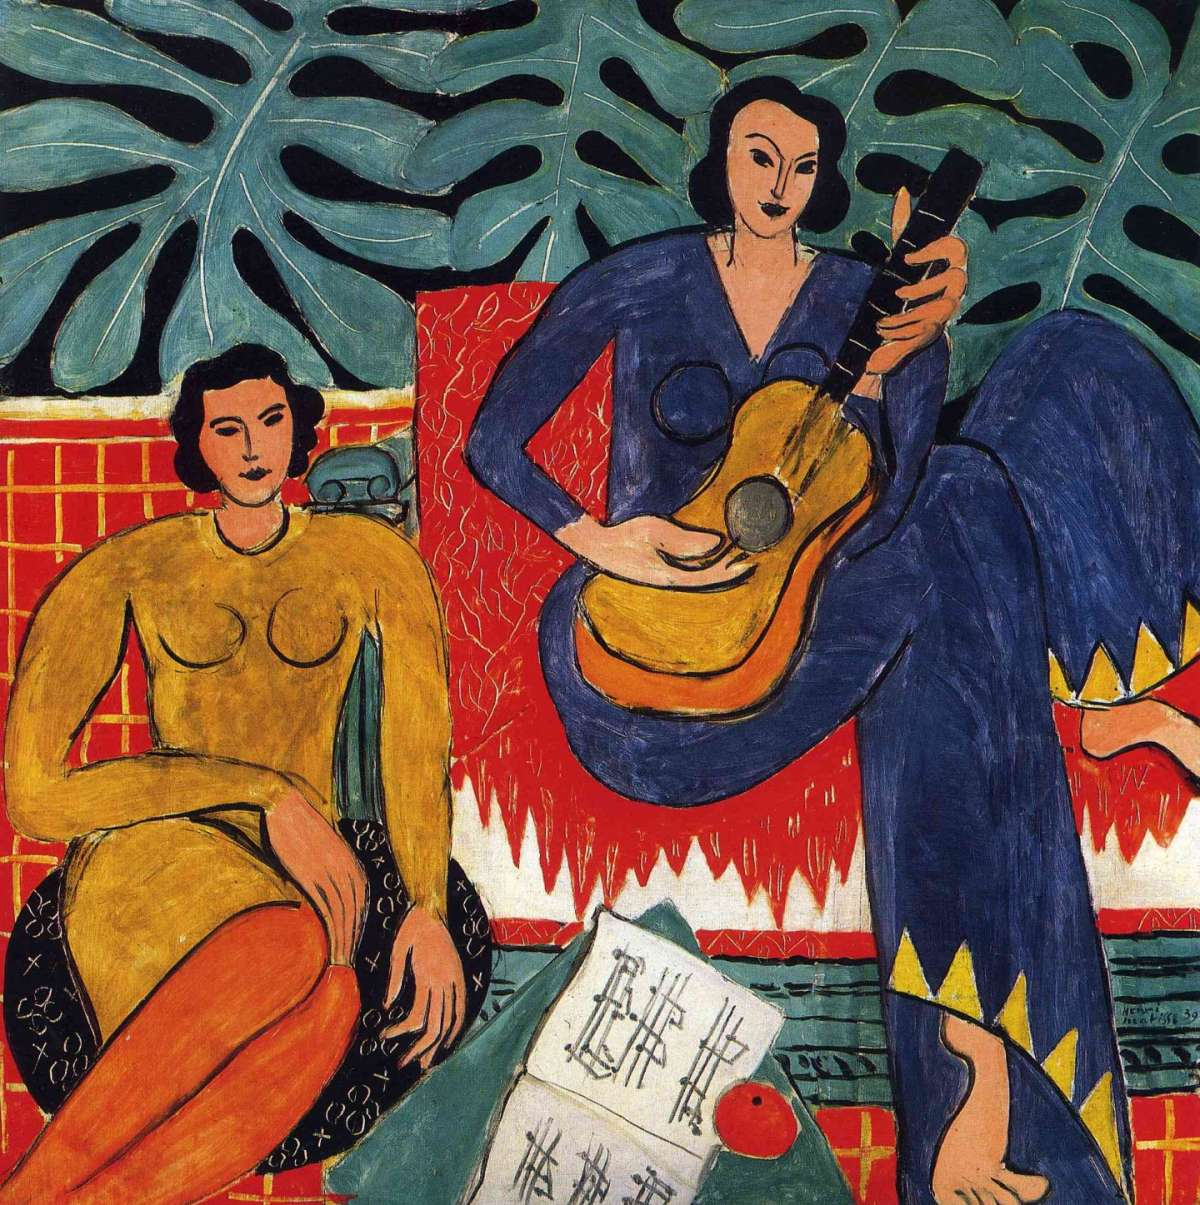 Musica, 1939